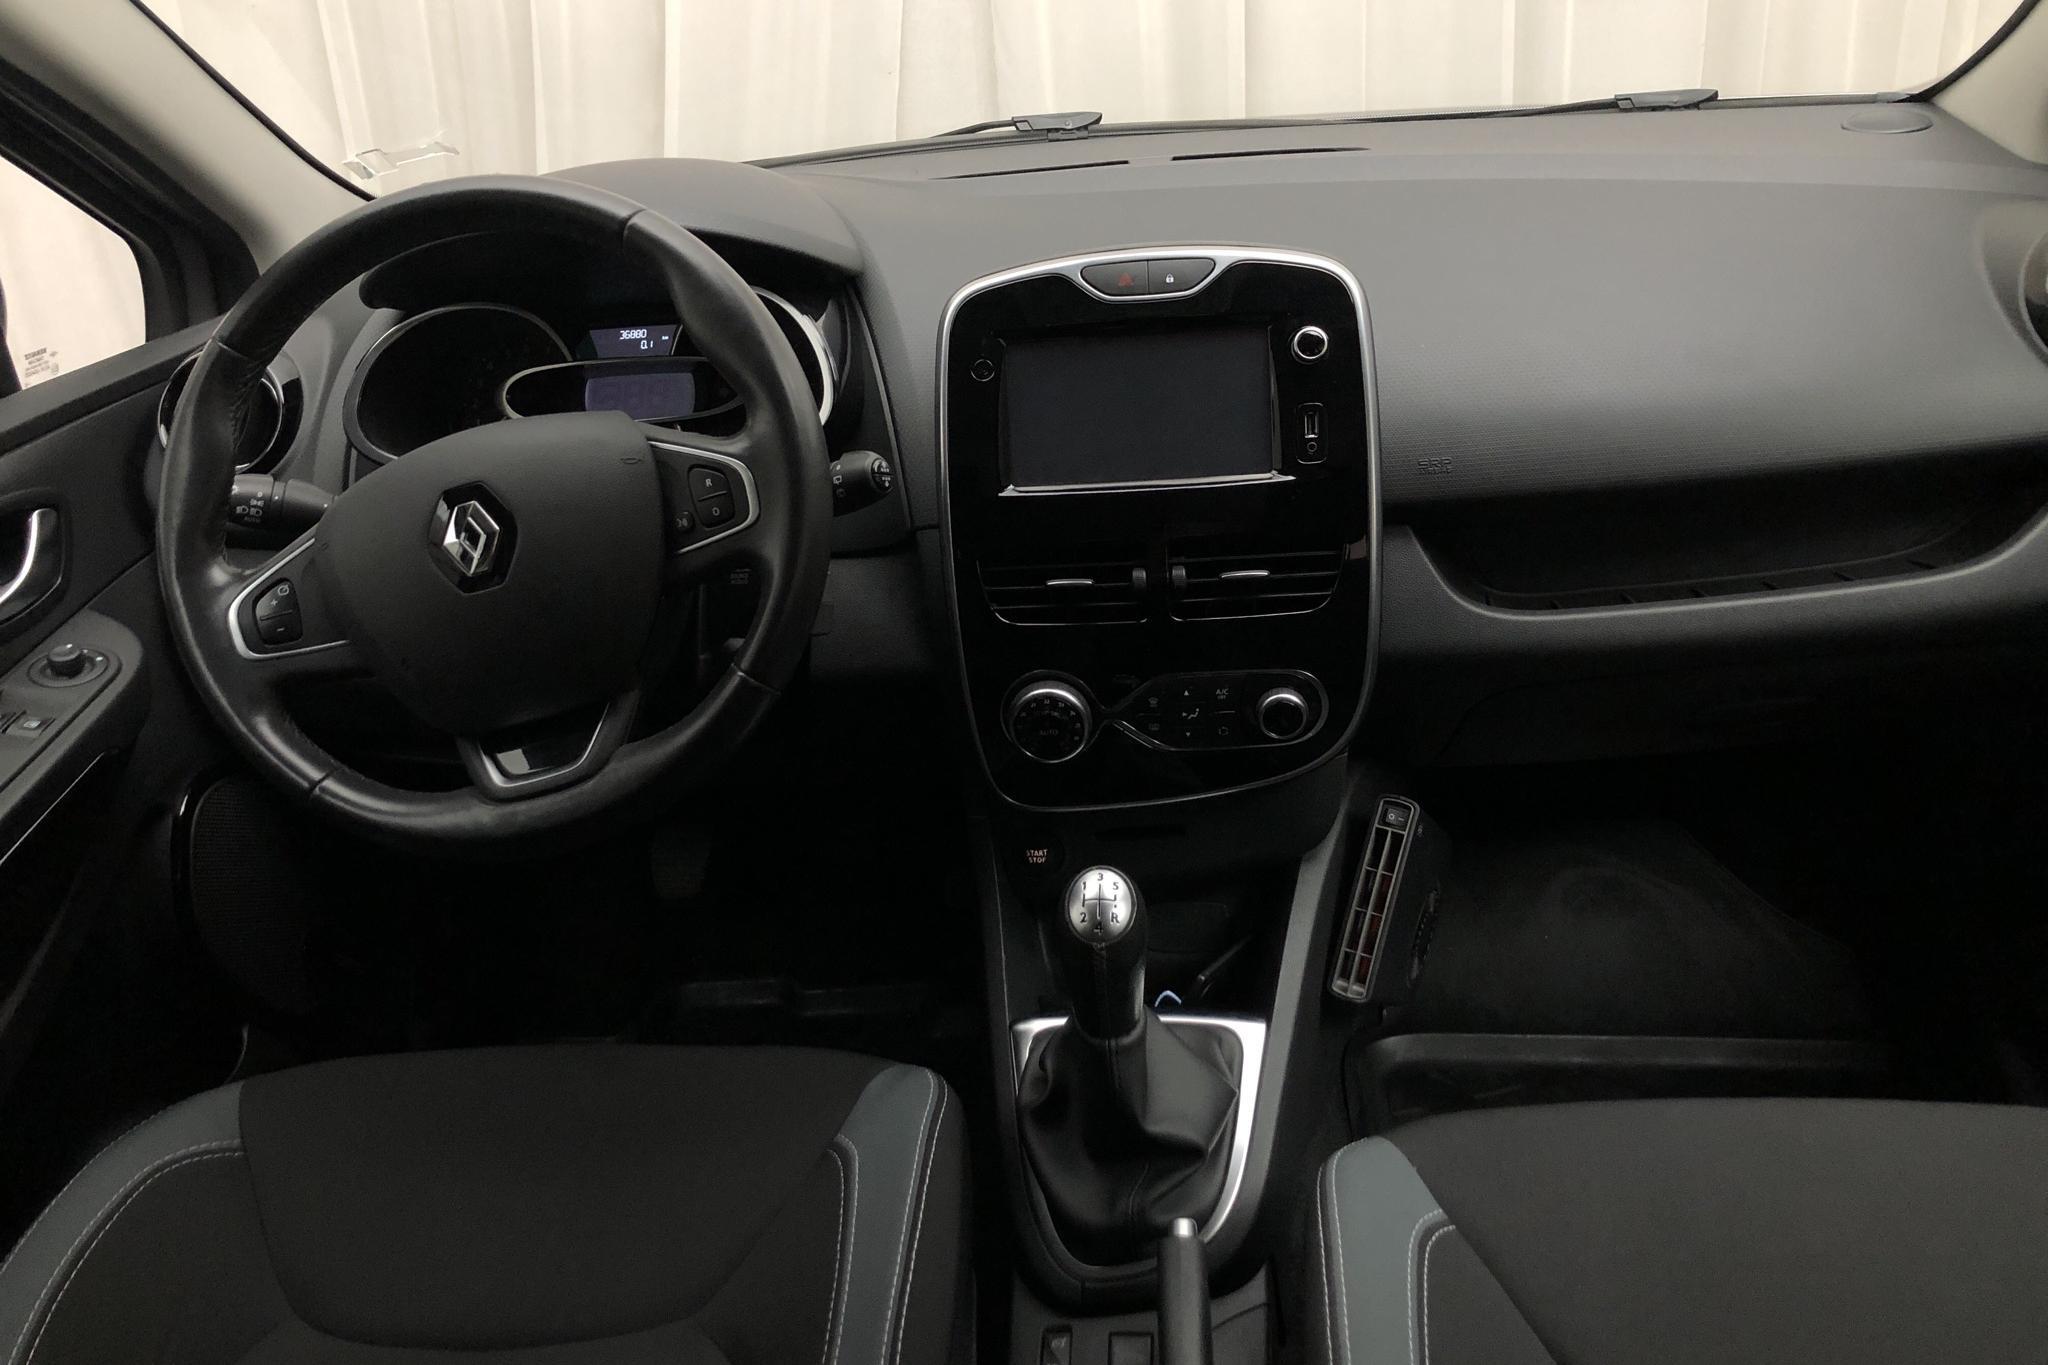 Renault Clio IV 0.9 TCe 90 5dr (90hk) - 3 688 mil - Manuell - grå - 2016